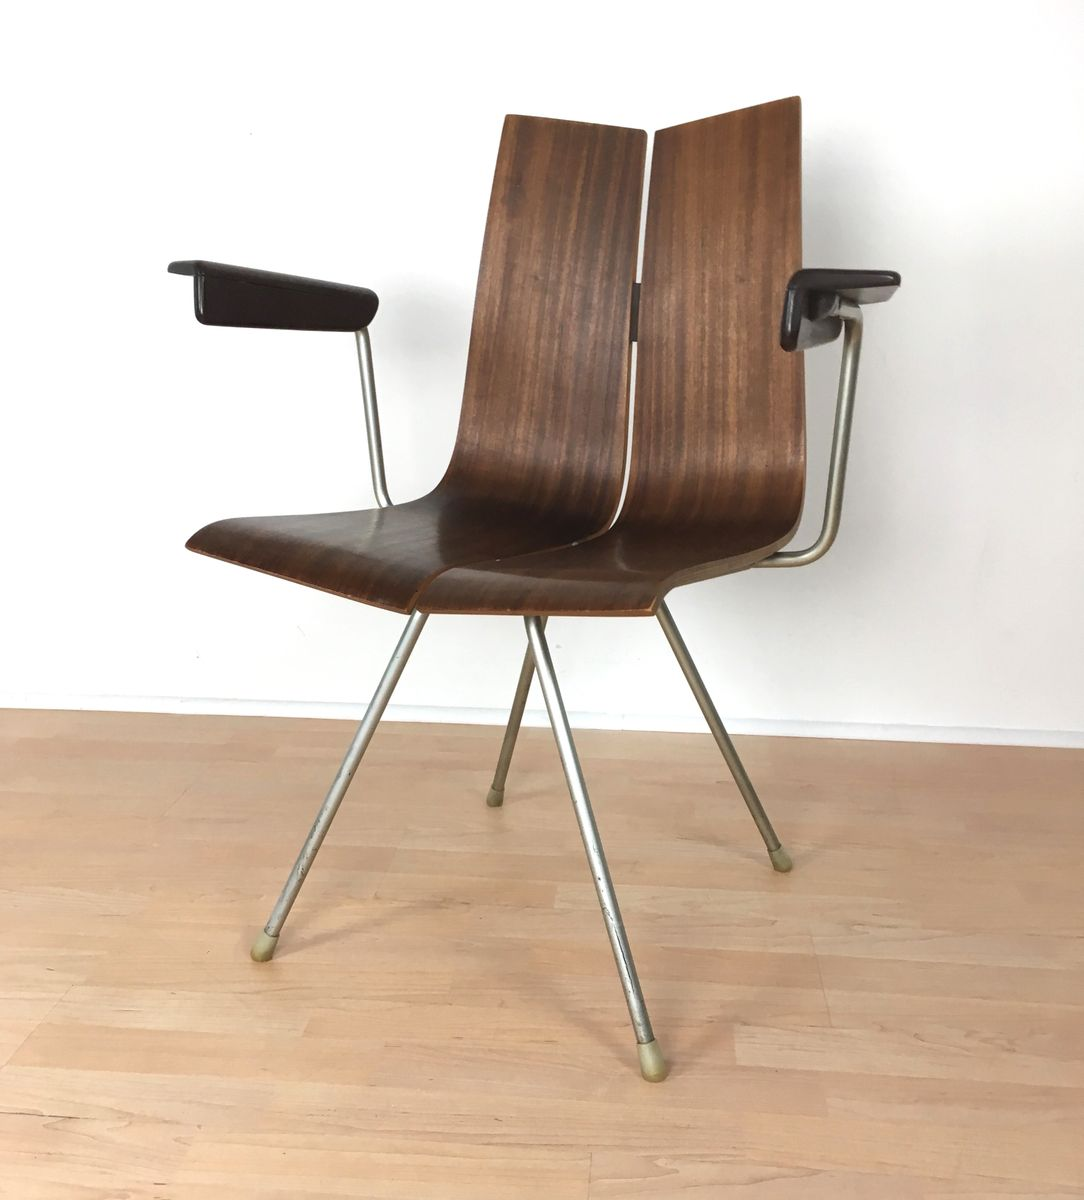 georgia chair company black and white chevron vintage swiss ga 4017 b ph typ 739 by hans